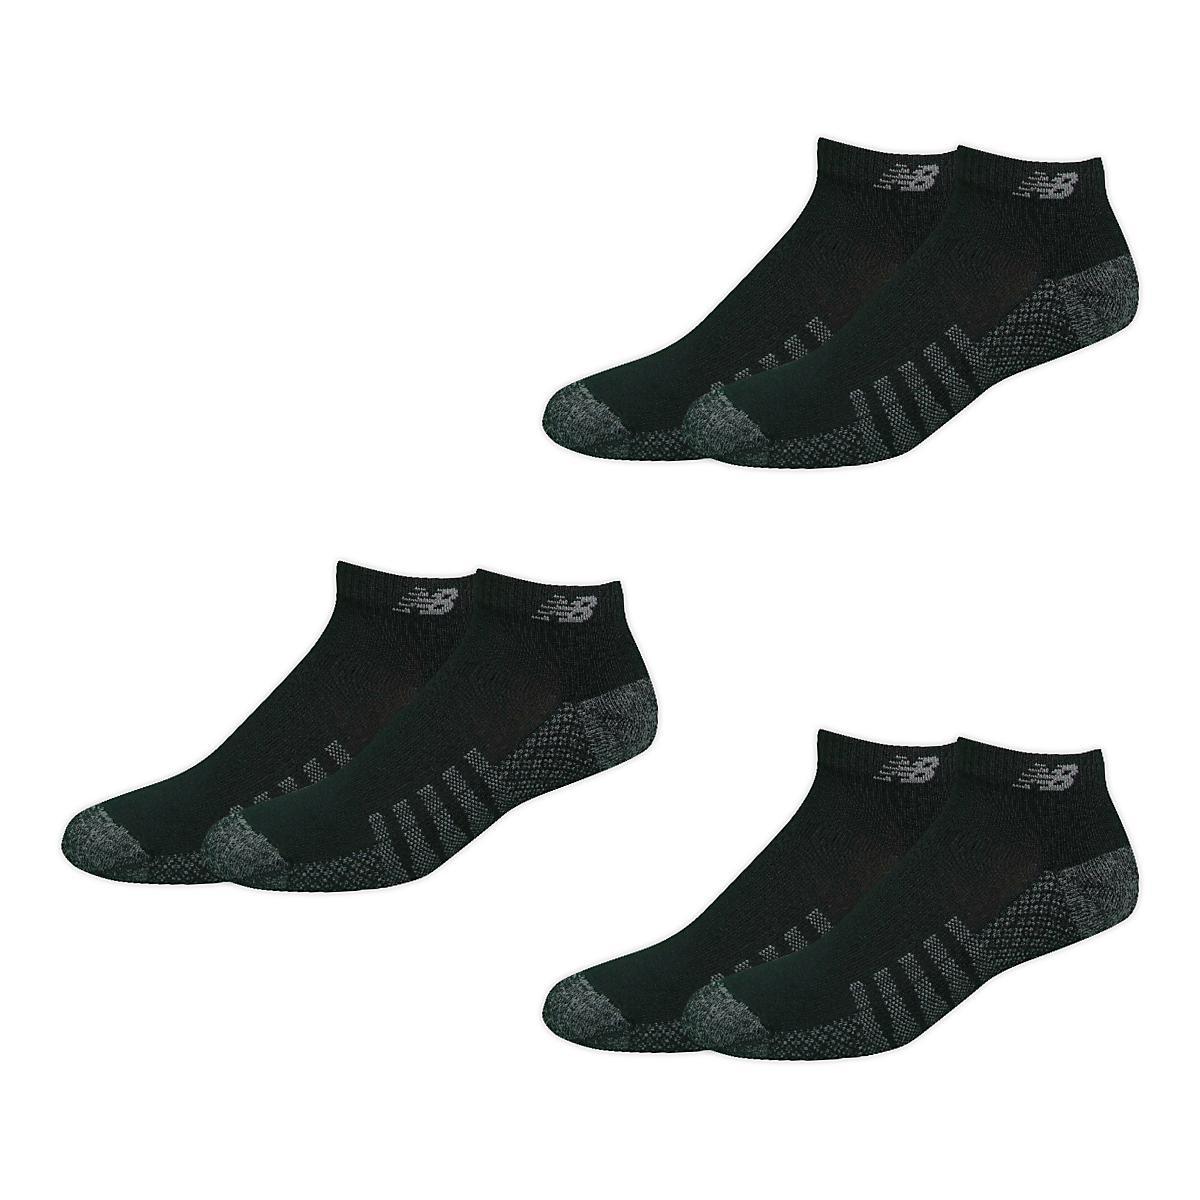 861772a8f23fd New Balance Technical Elite Coolmax Low Cut 6 Pack Socks at Road Runner  Sports